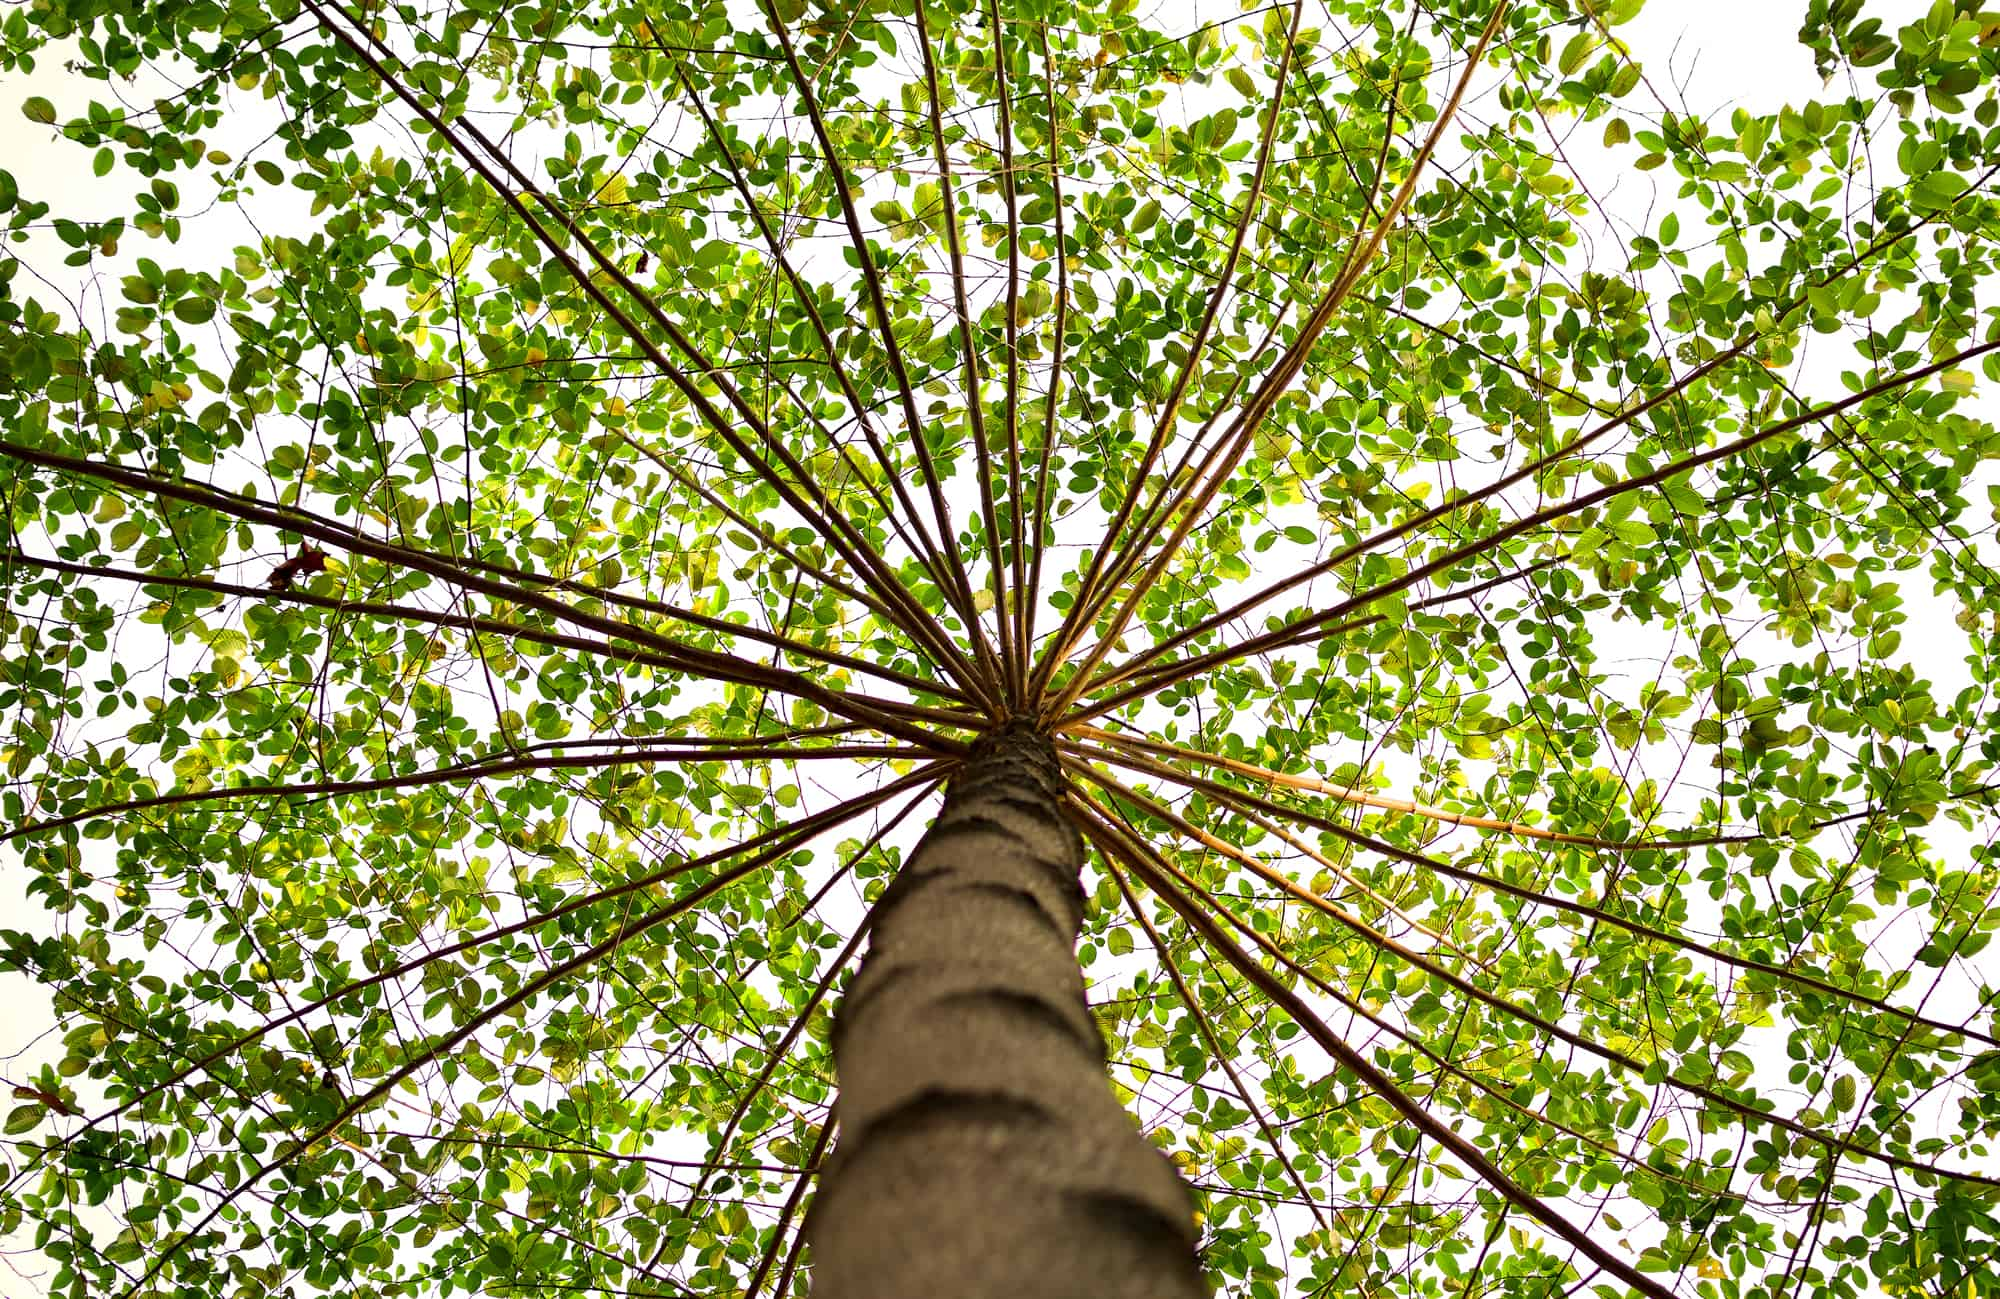 tree-branch-leaves-sky